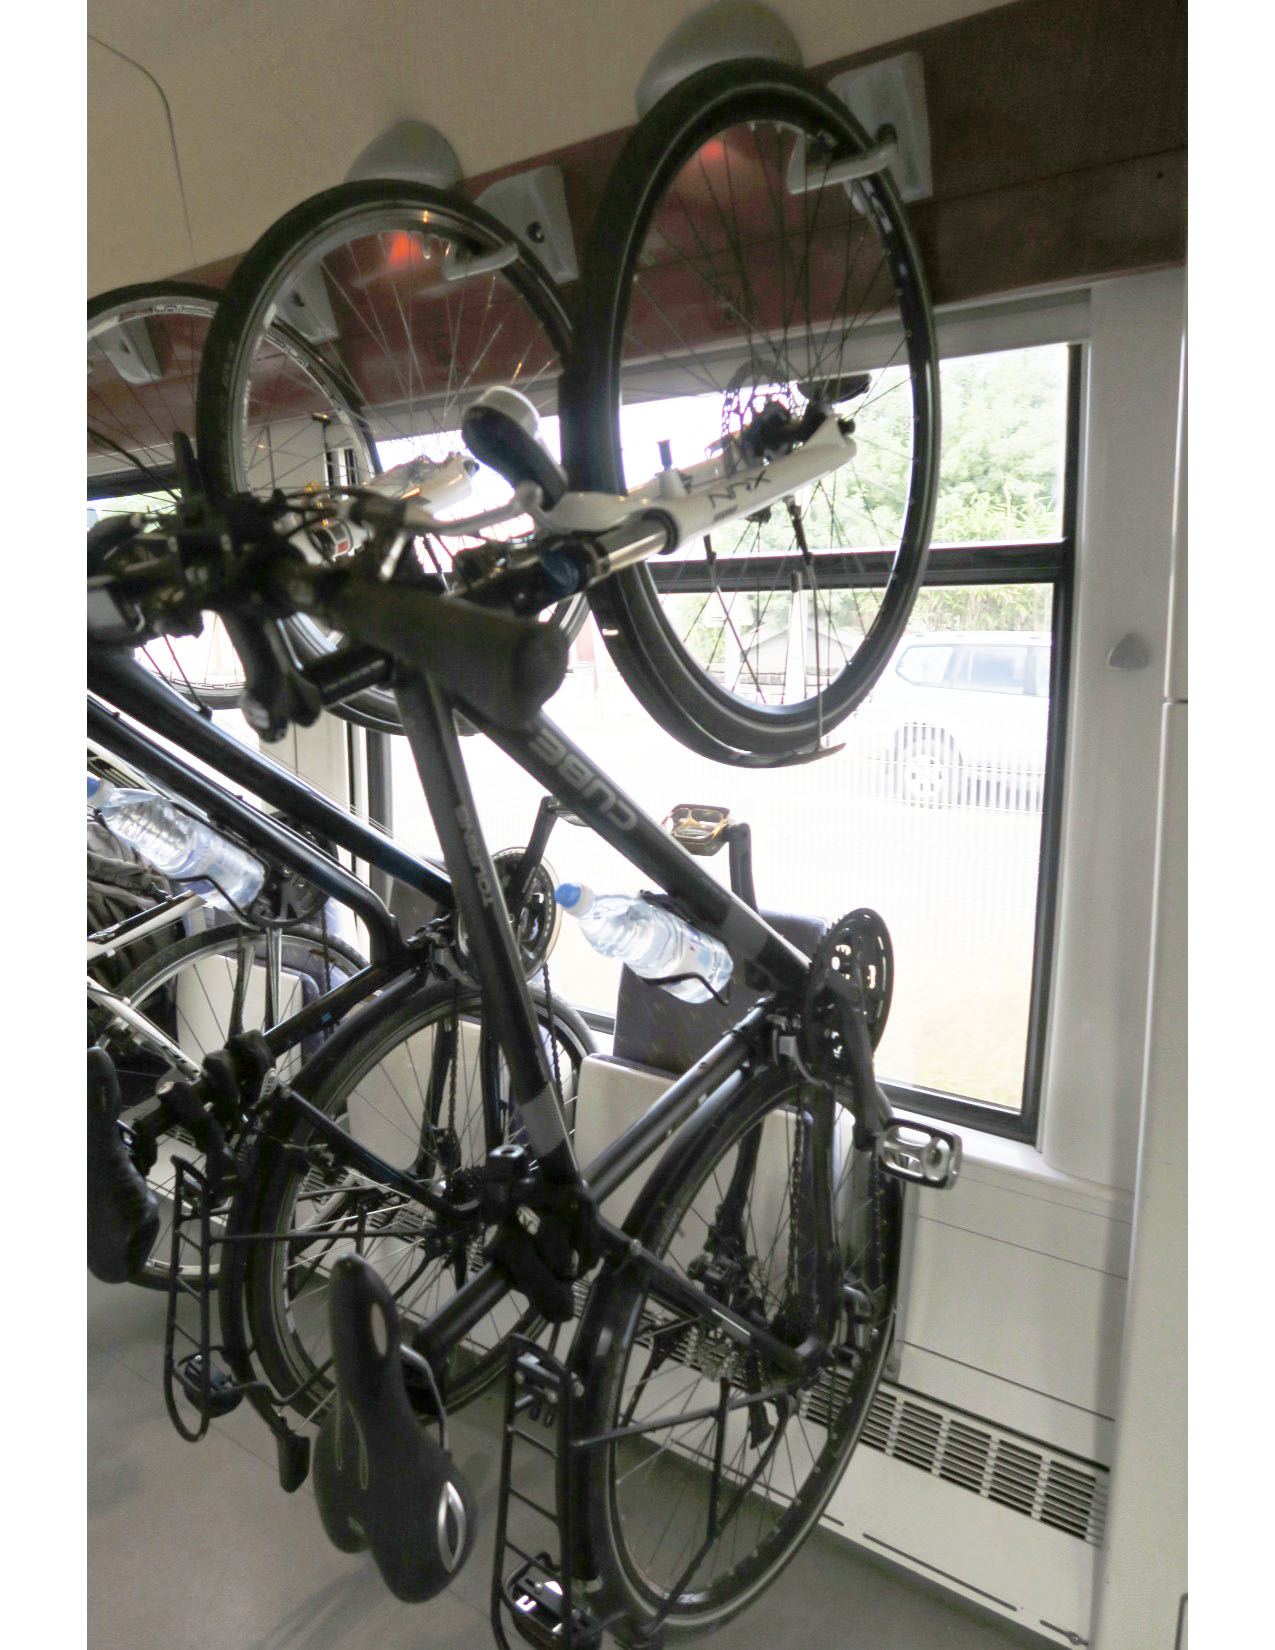 Bikes on train_2.jpg